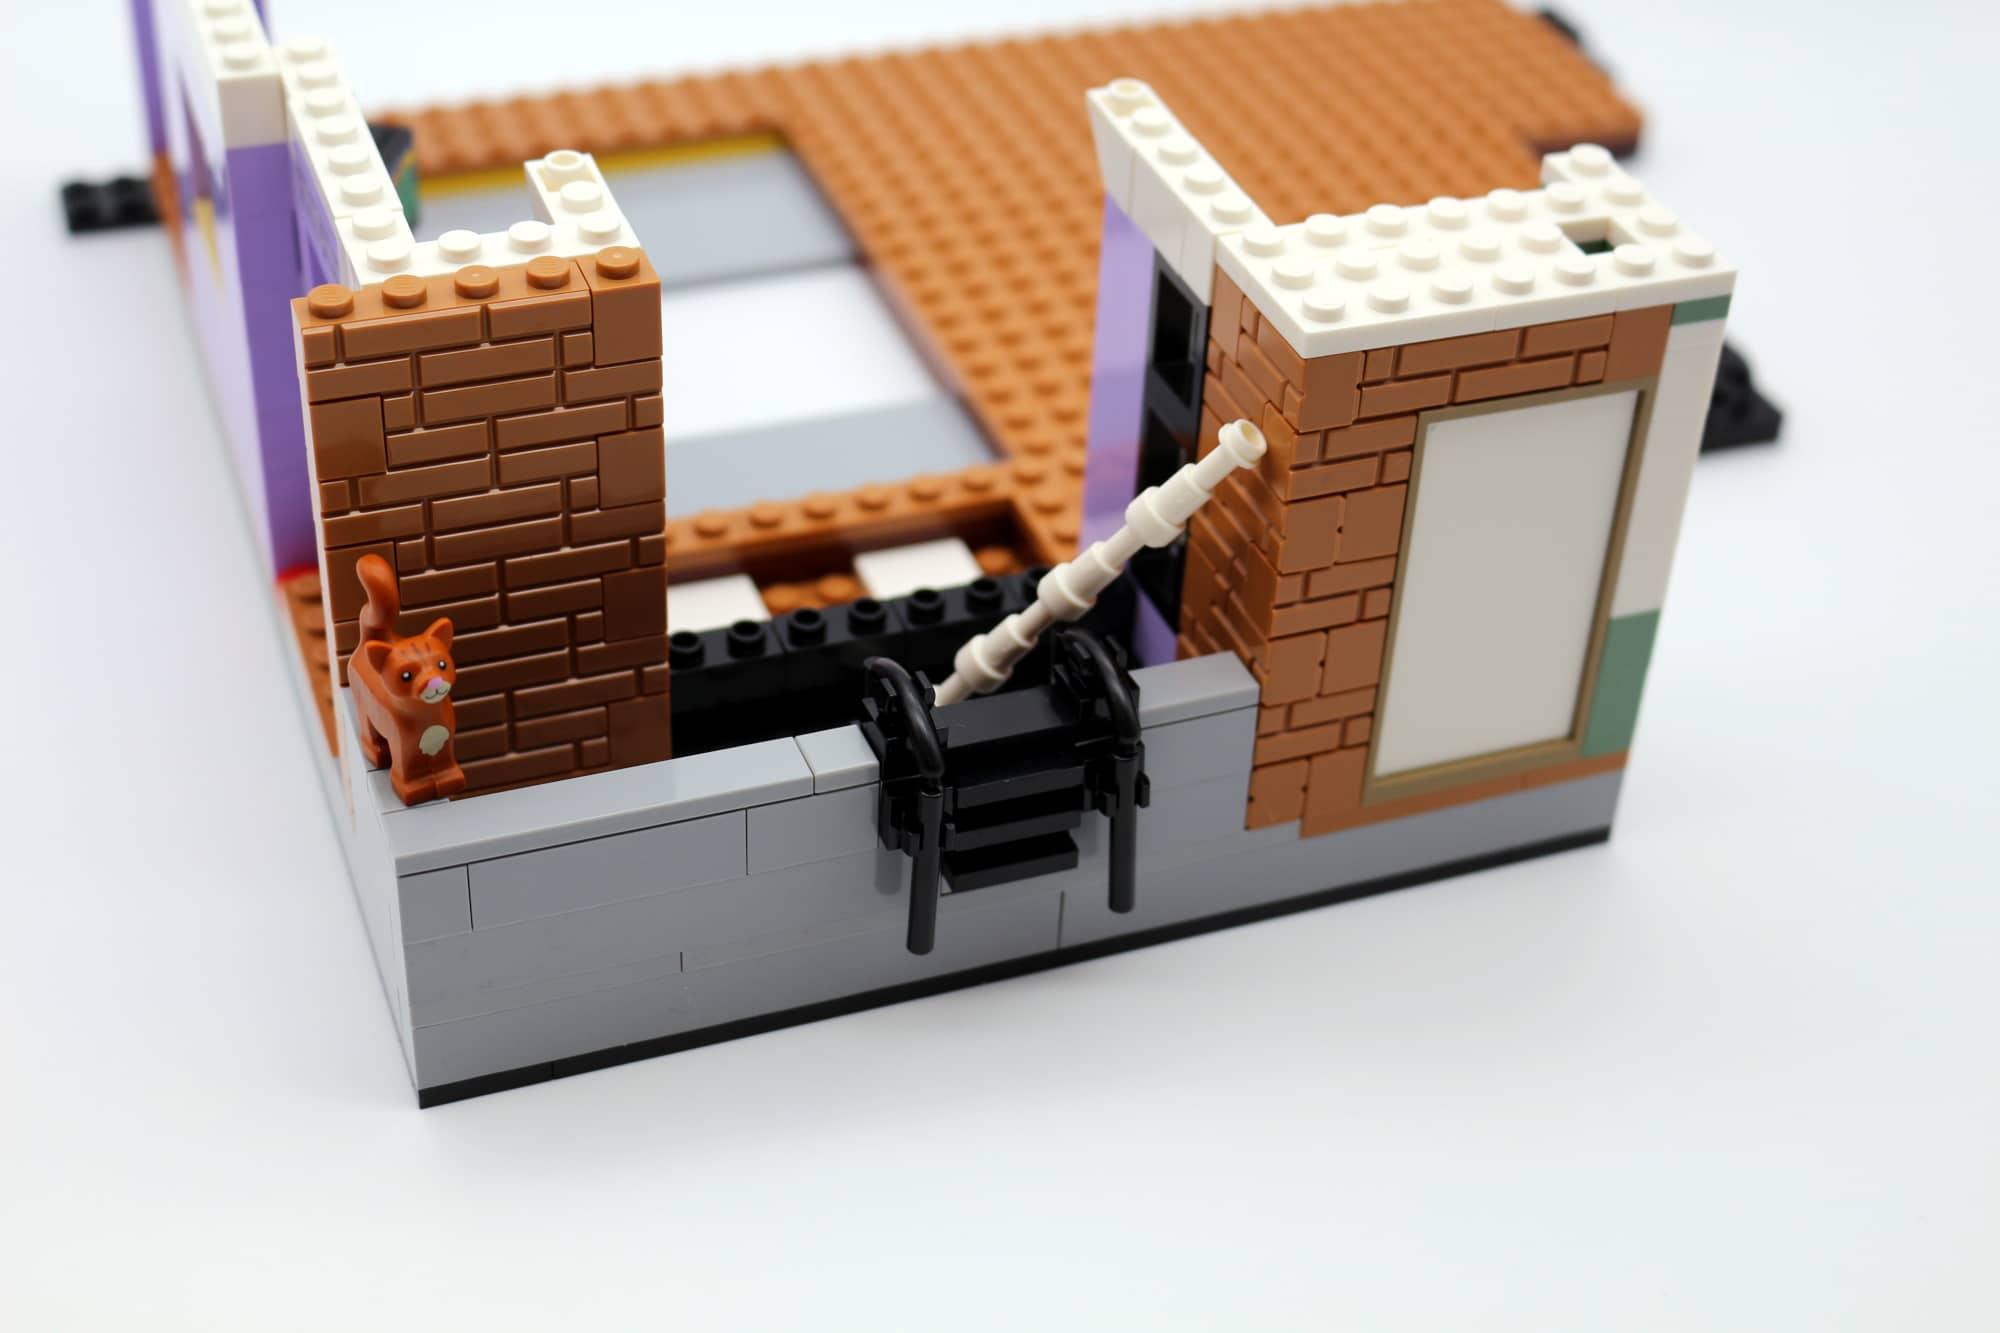 LEGO Friends 10292 The Friends Apartments 36